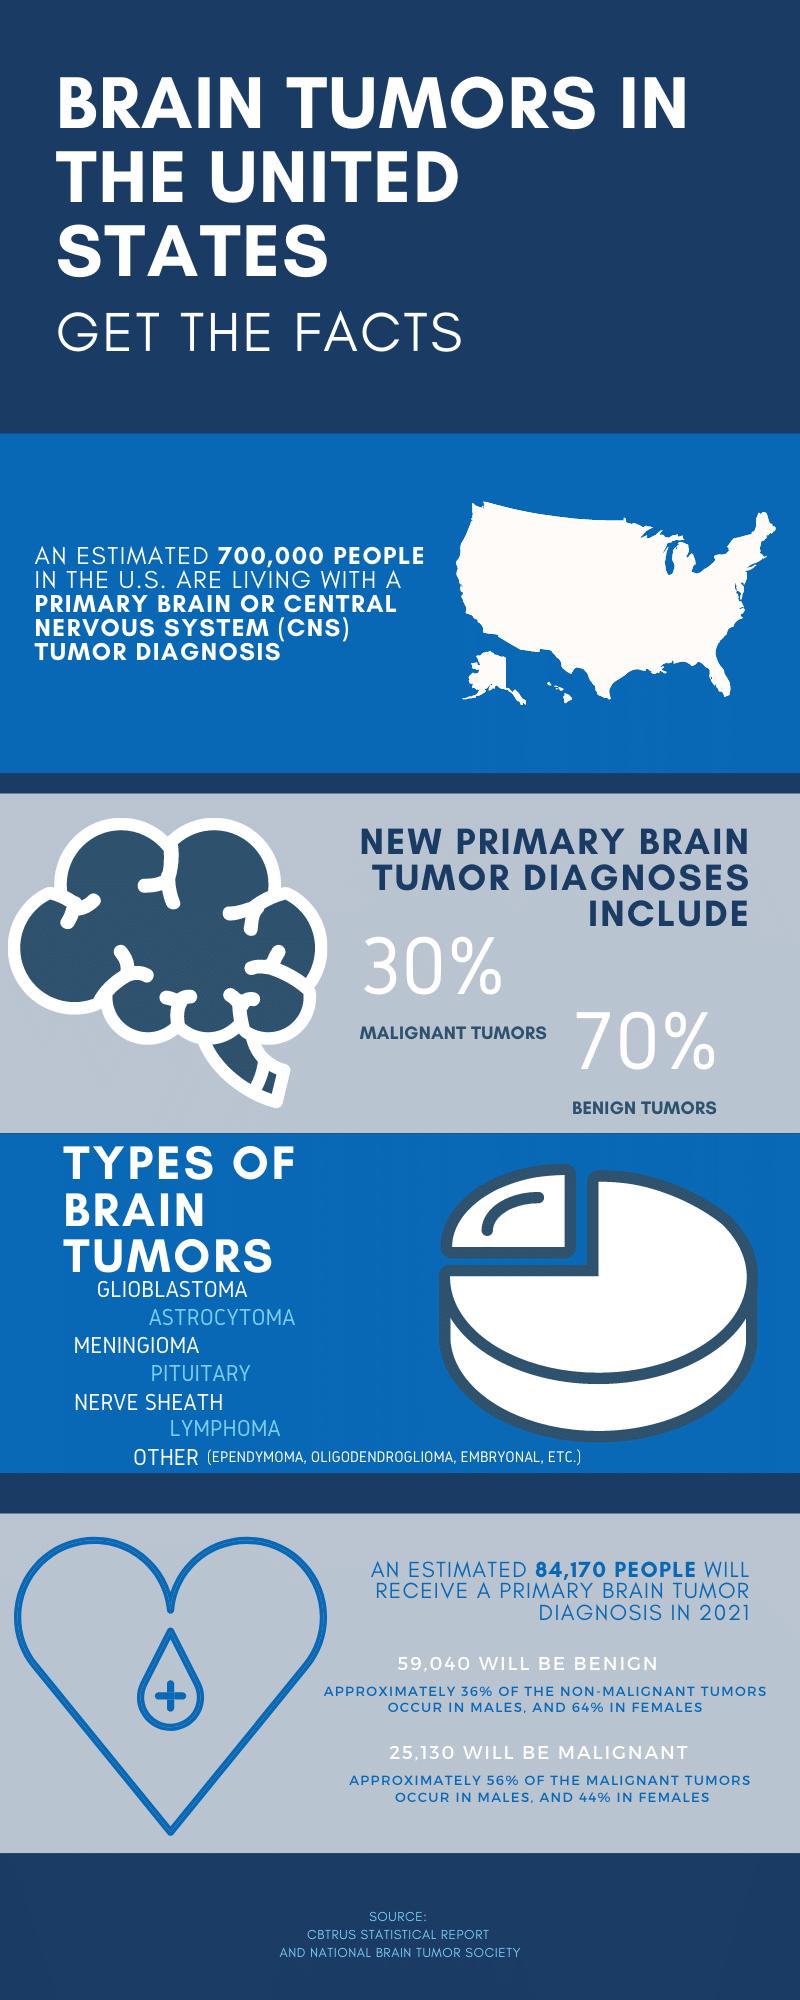 SDBTF Brain Tumor Facts Infographic